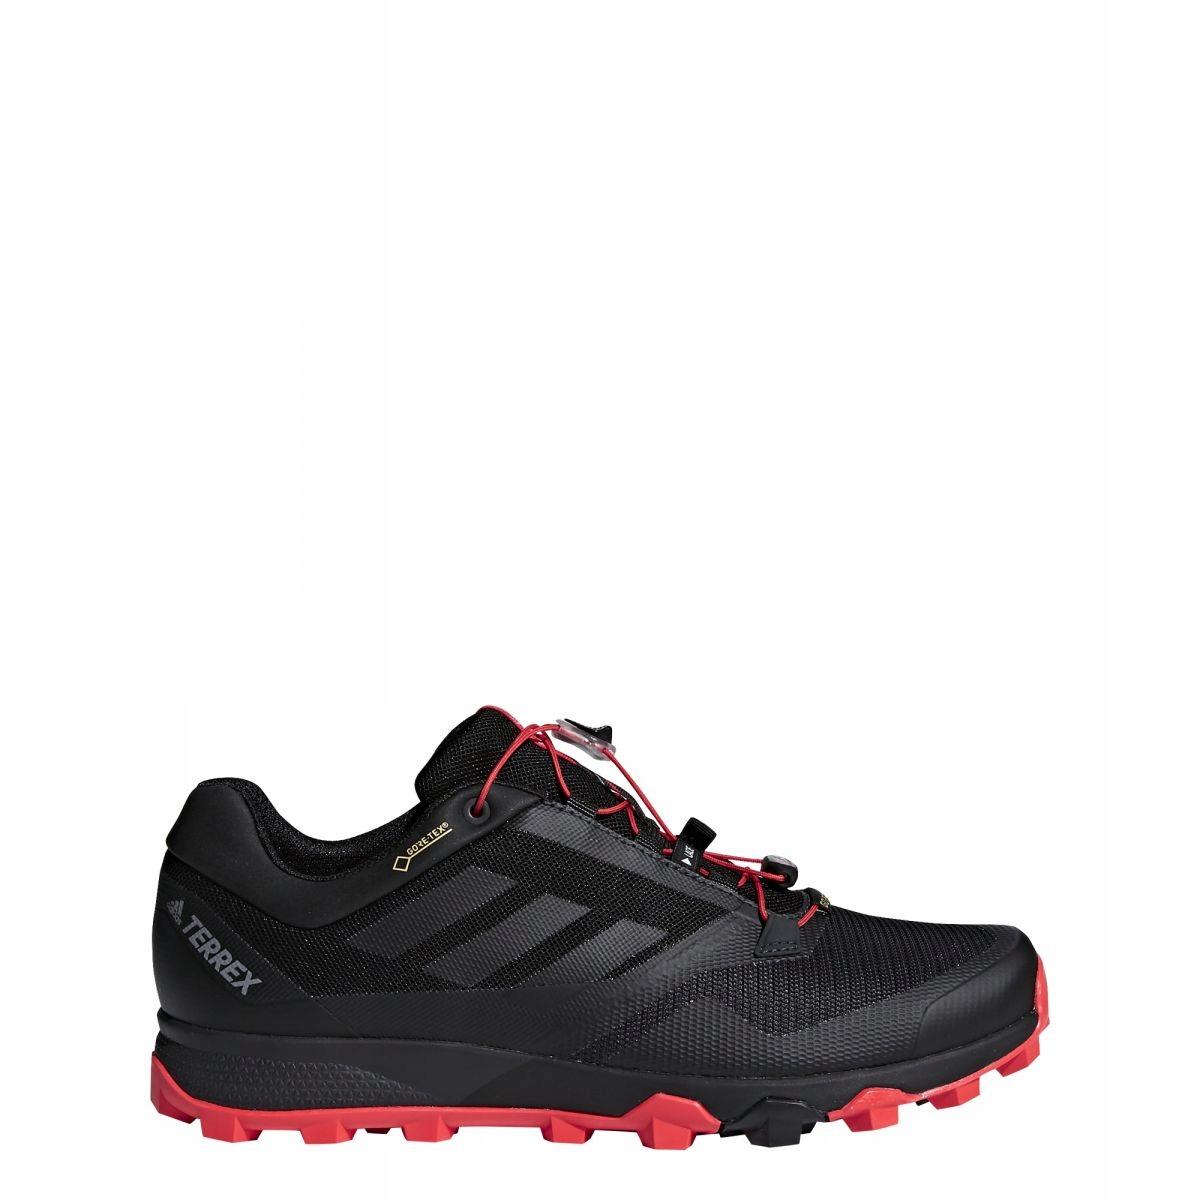 best price skate shoes to buy Buty adidas Terrex Trailmaker GTX CM7620 44 - 7679464361 ...